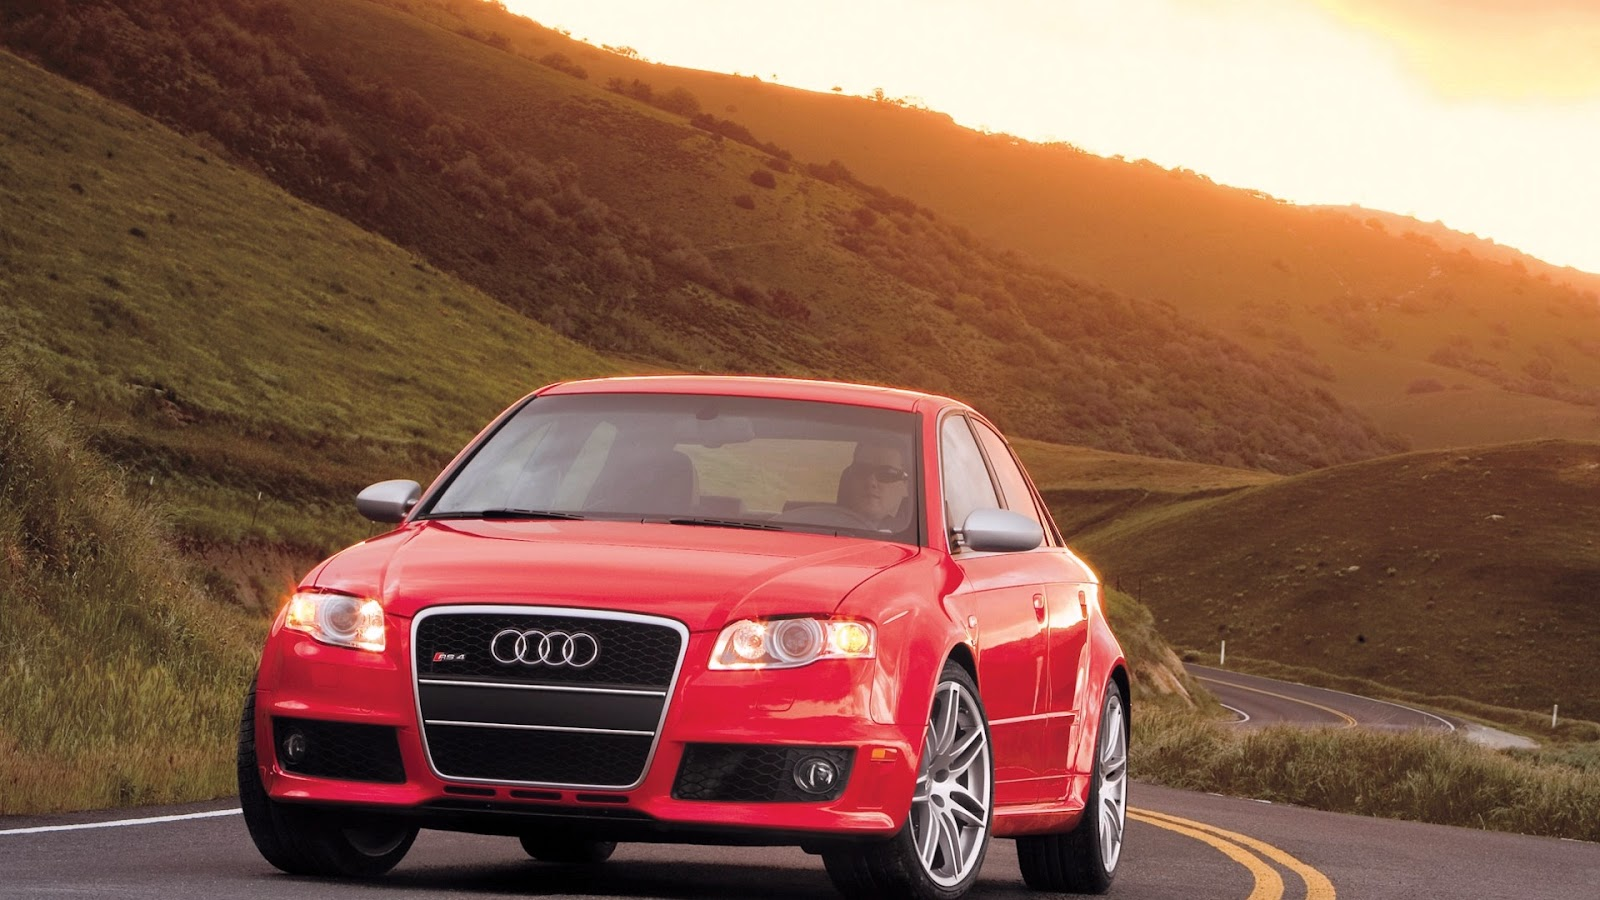 http://2.bp.blogspot.com/-9S-m32Wo5GY/TlDCyd_lb_I/AAAAAAAAFaA/kS-s-zOZfq4/s1600/Audi+Car+HD+Wallpaper+1920+X+1080+374.jpg